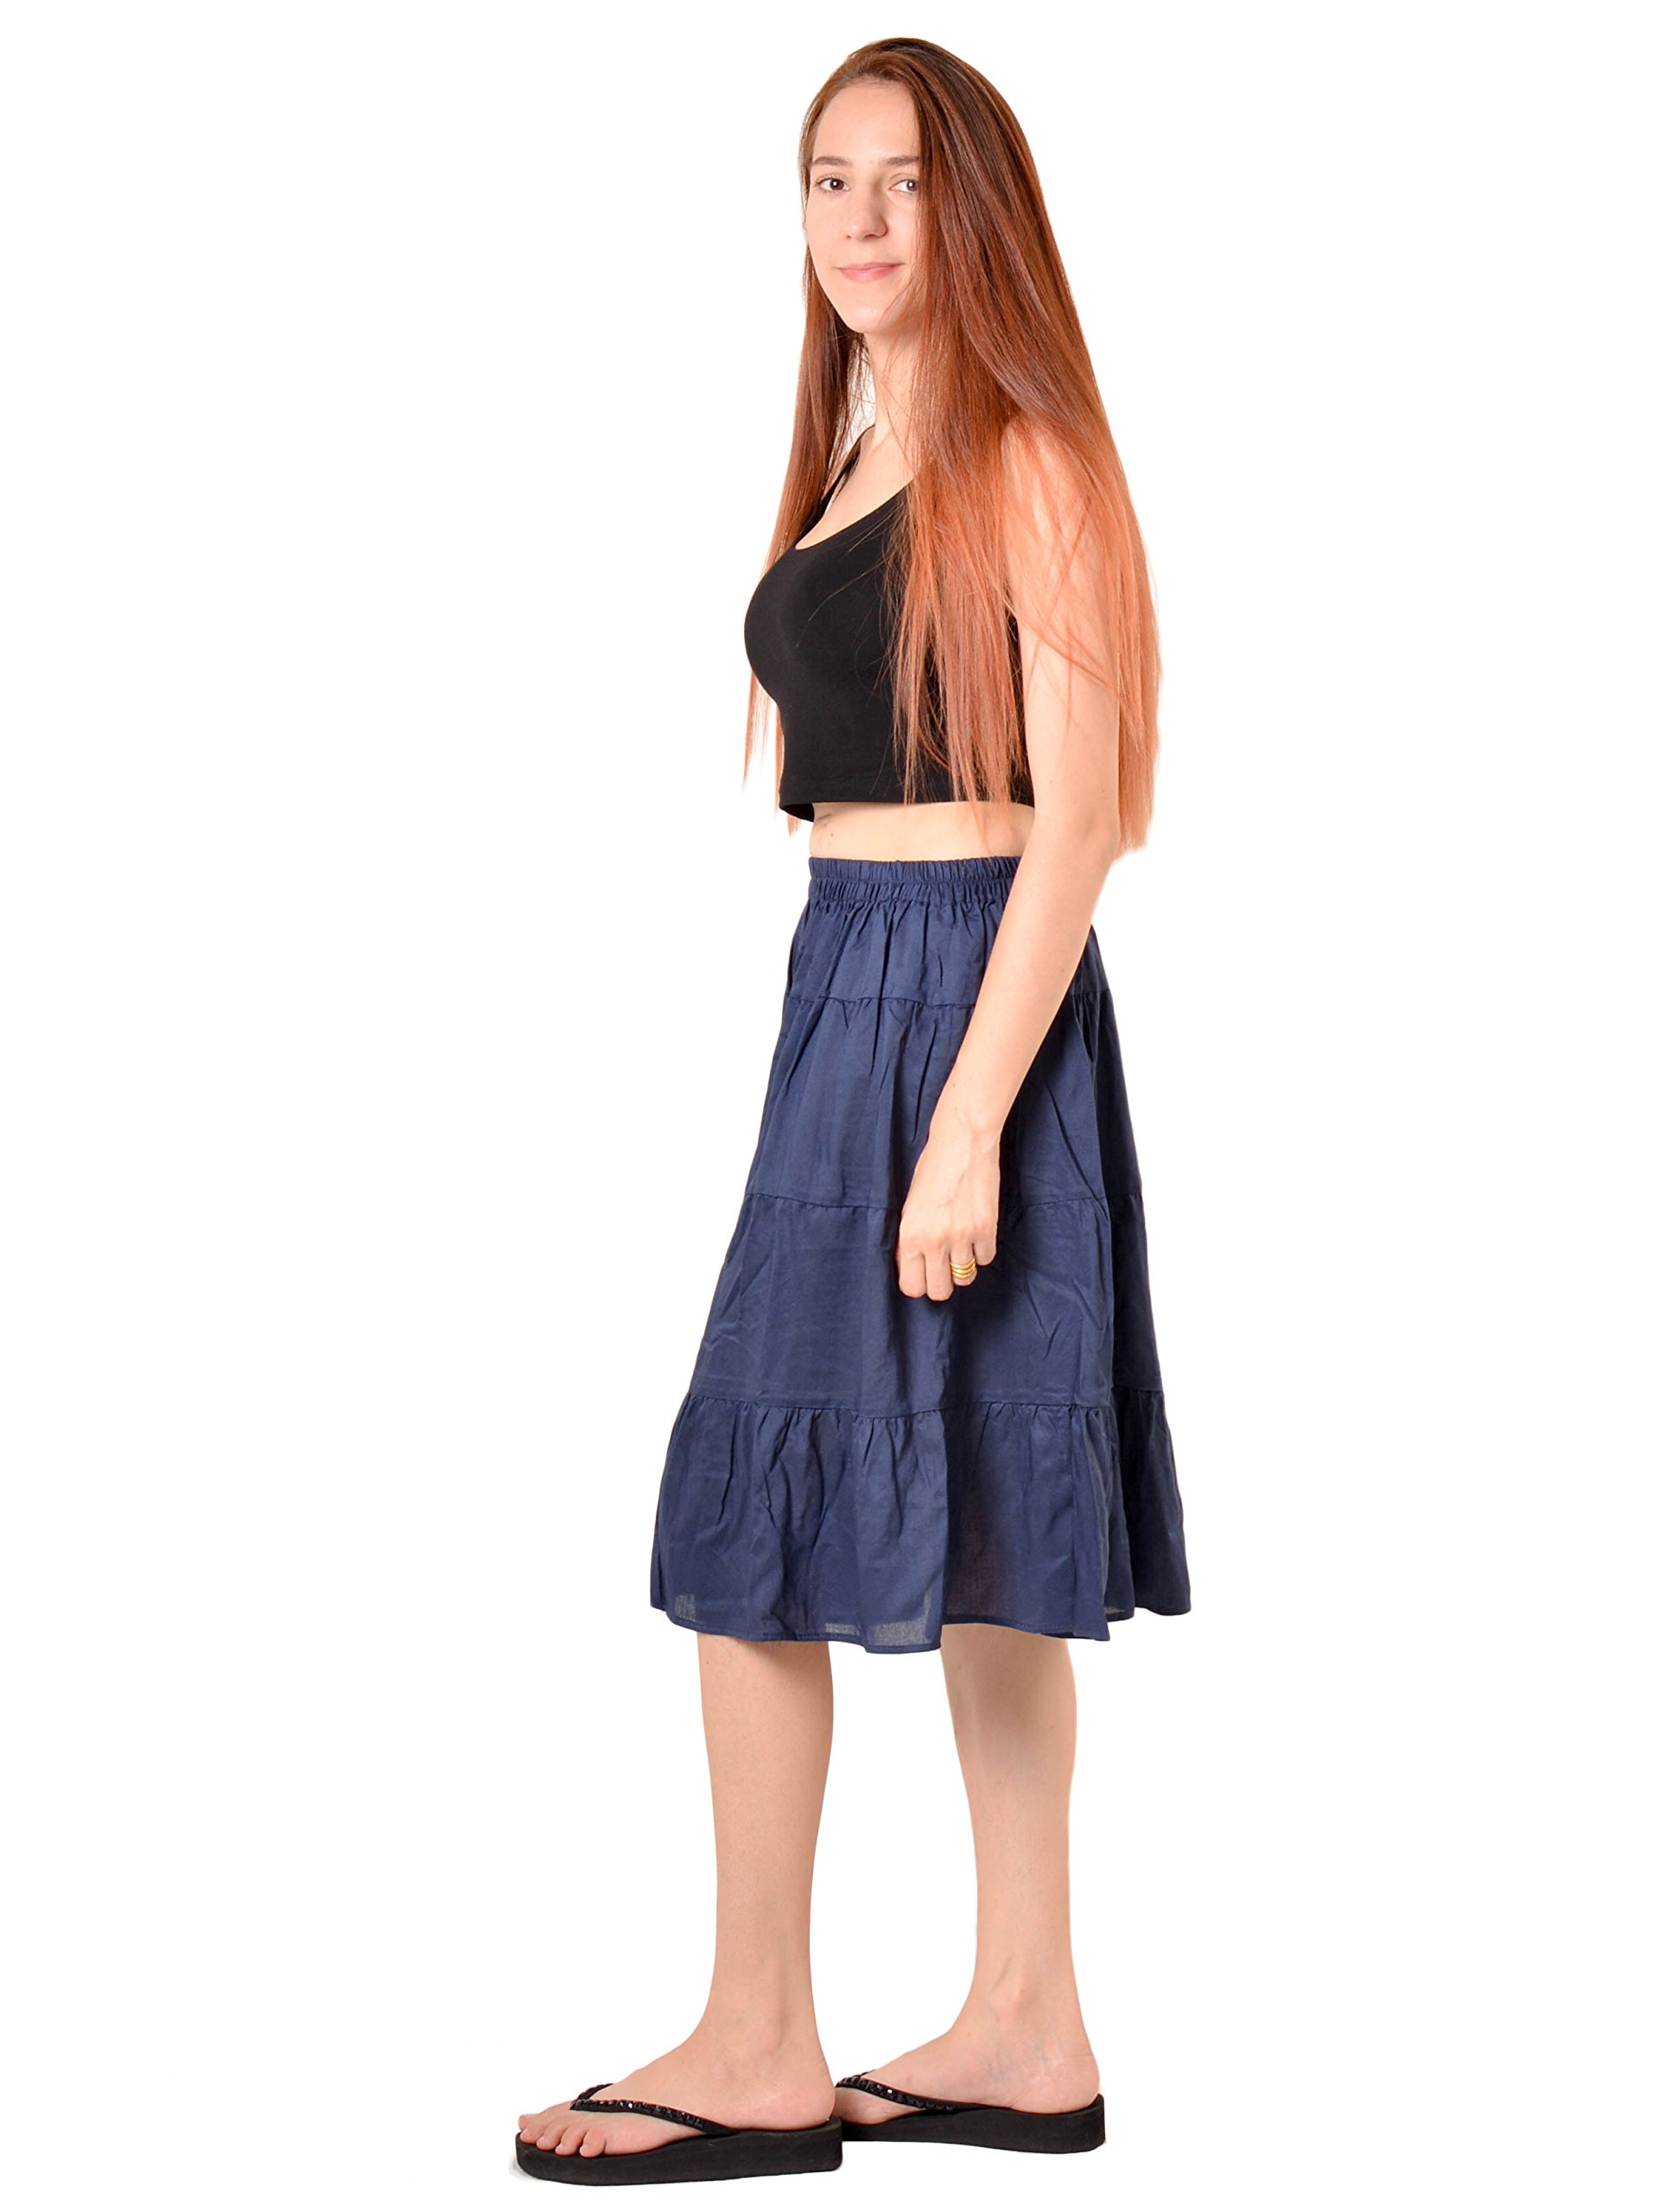 Orient Trail Women's Hippie Bohemian Boho Knee Length Skirt Medium Dark Blue by Orient Trail (Image #4)